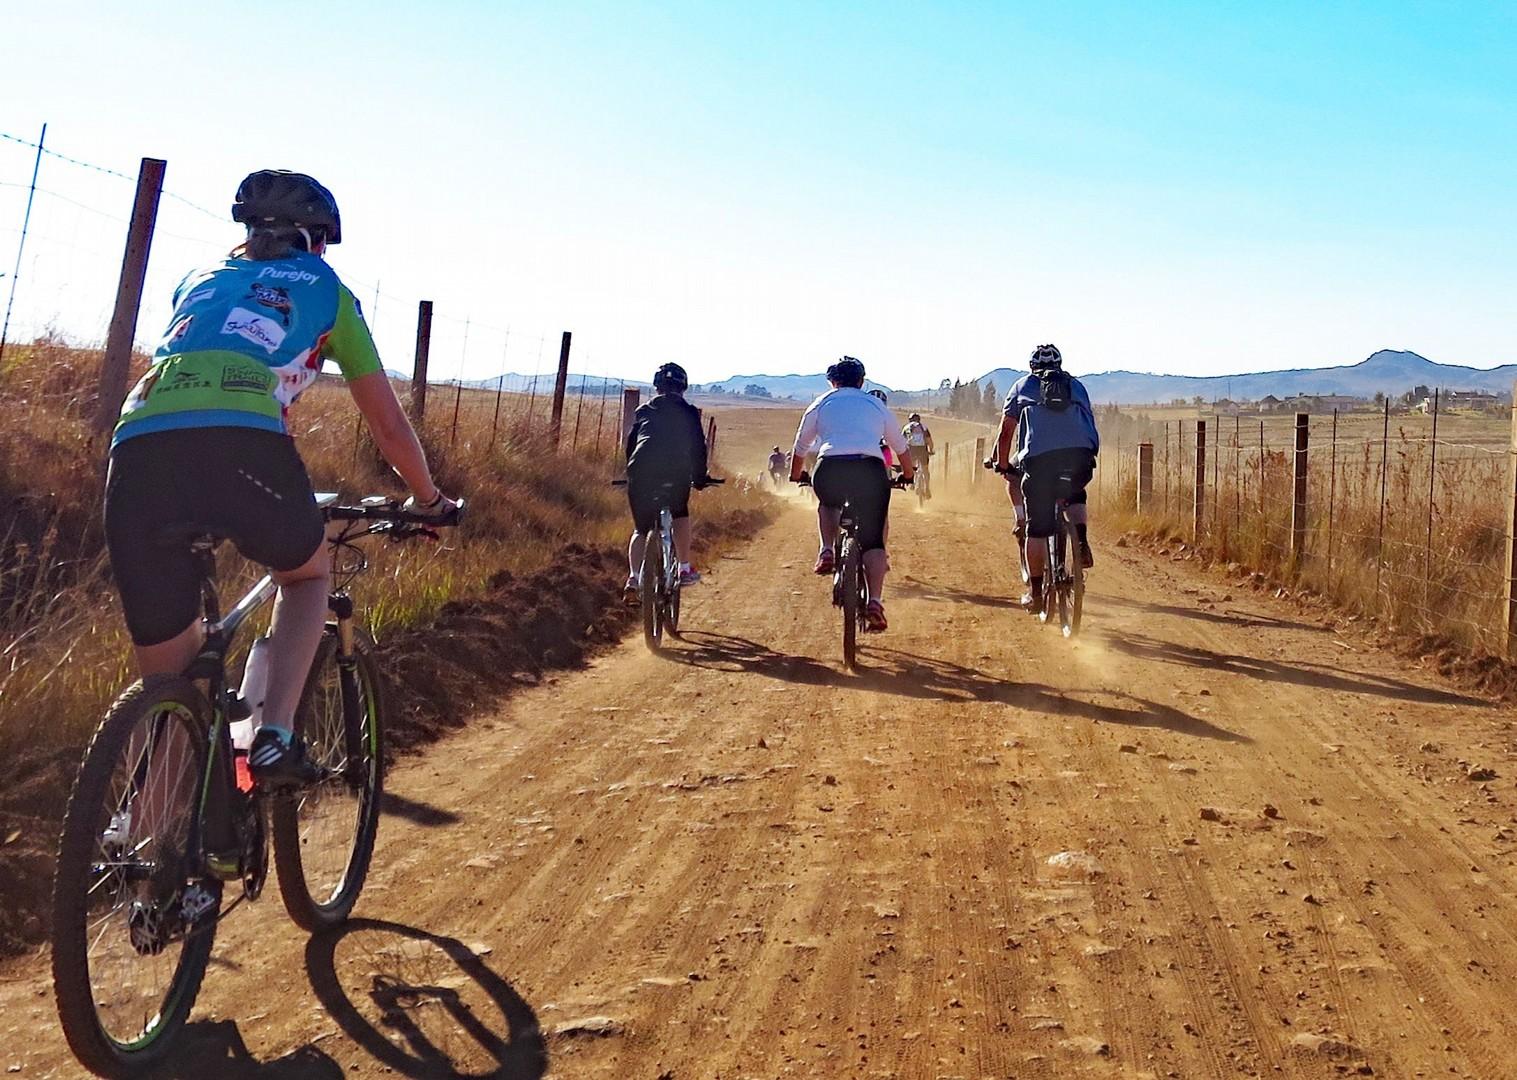 wildlife-mountain-bike-holiday-in-africa-swaziland.jpg - Swaziland - Singletrack and Sundowners - Guided Mountain Bike Holiday - Mountain Biking